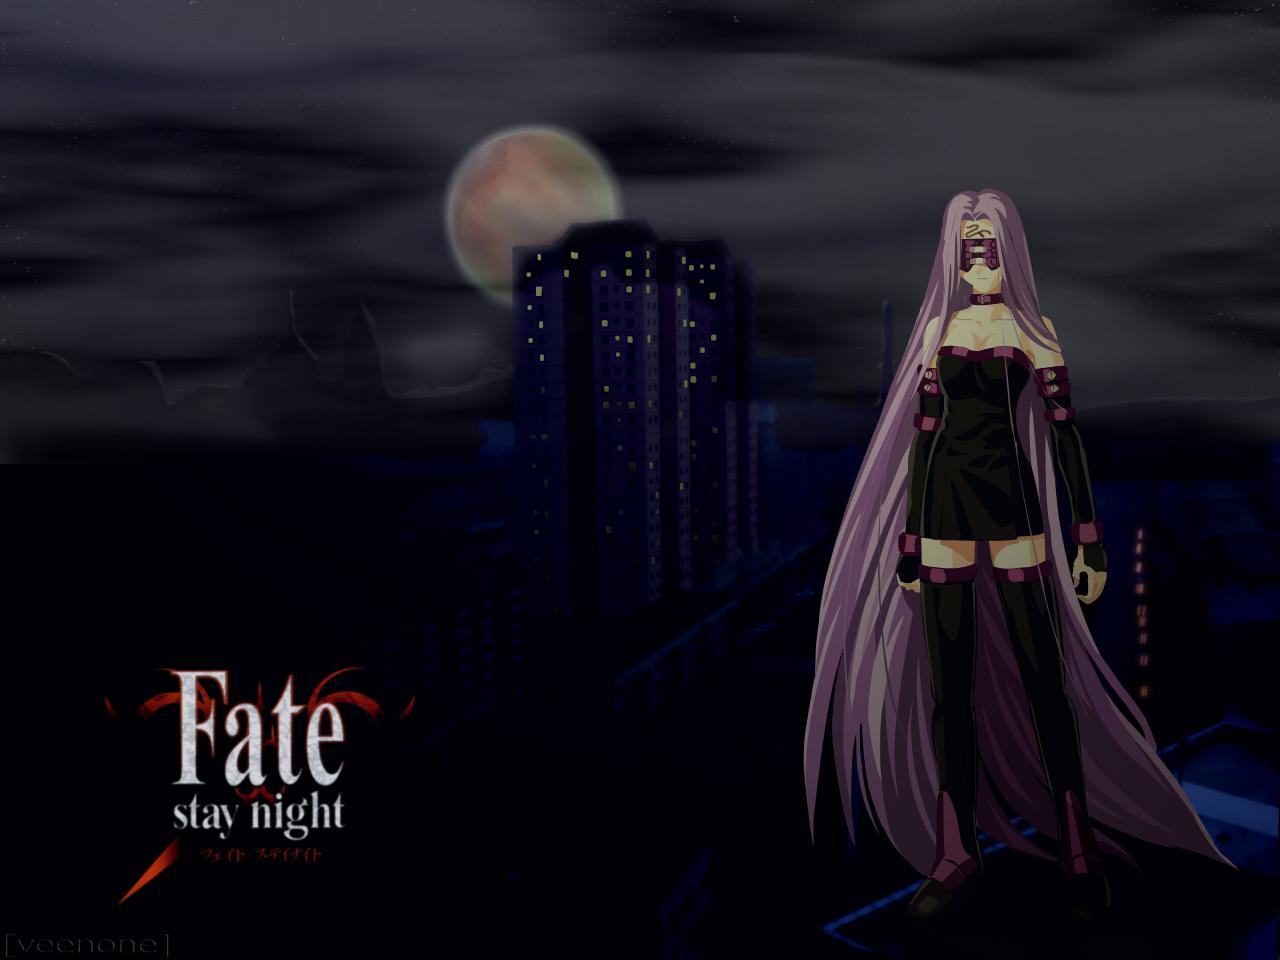 [AnimePaper]wallpapers_Fate-Stay-Night_veenone_22440